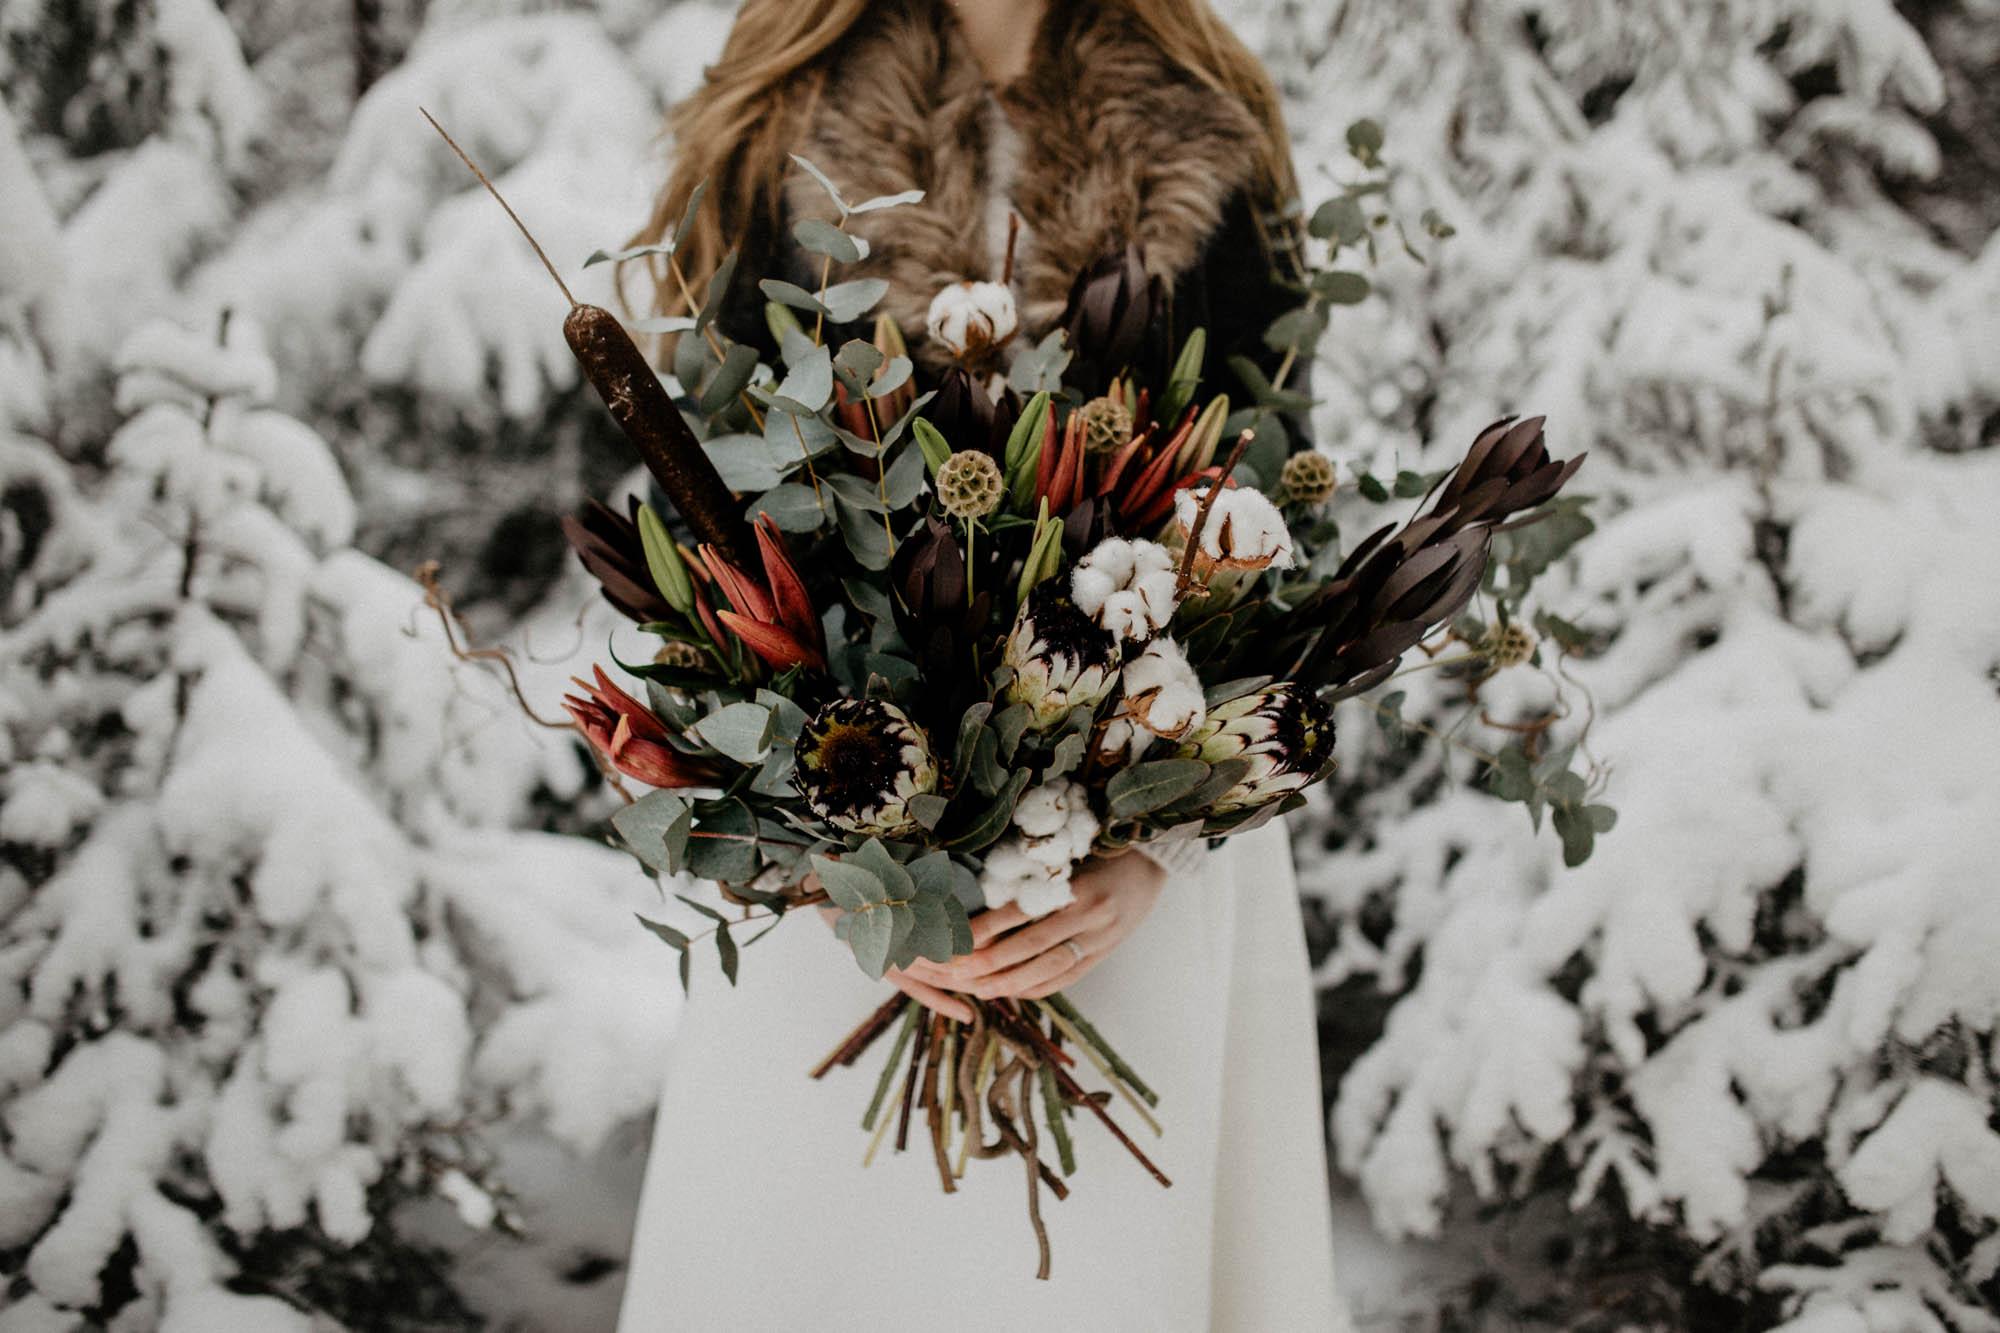 ashley_schulman_photography-winter_wedding_tampere-35.jpg